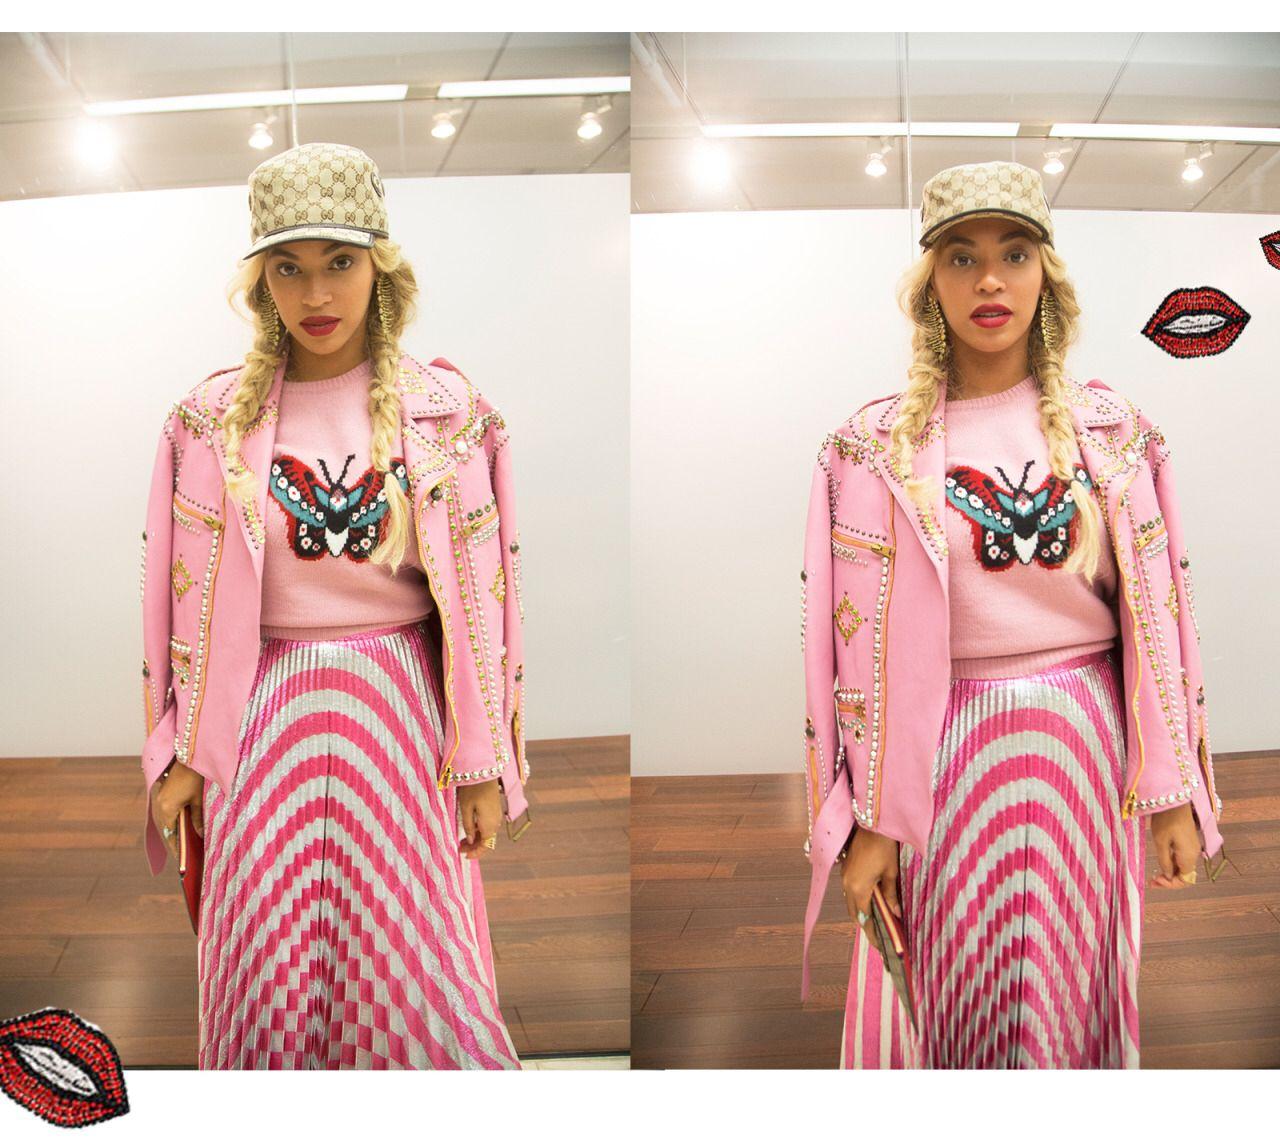 Beyoncé in New York City, (Oct. 3rd, 2016)   Beyoncé 2016 Part 2 ...